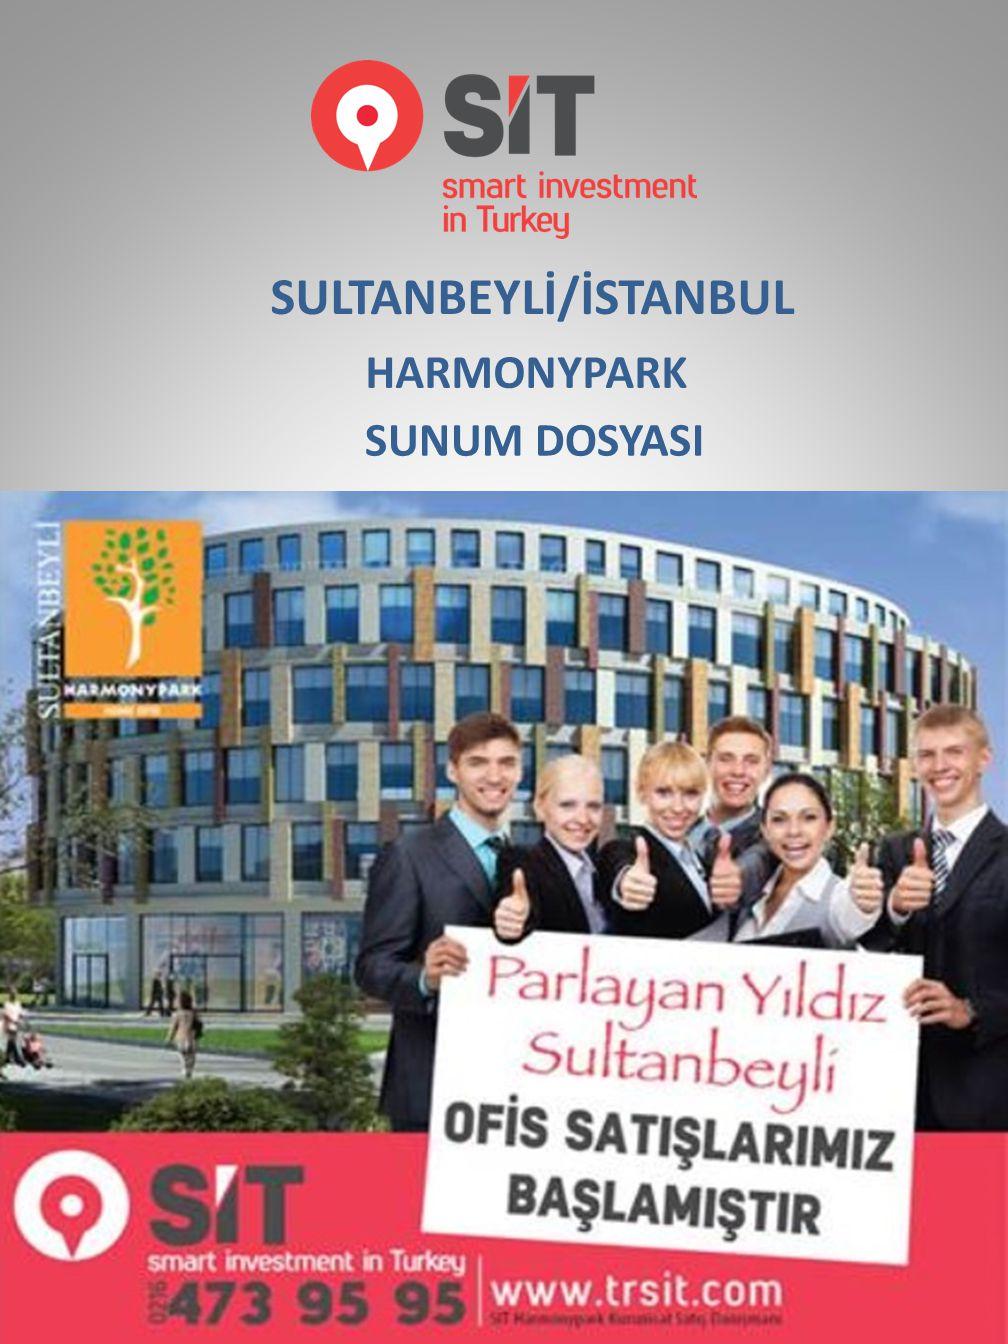 SULTANBEYLİ/İSTANBUL